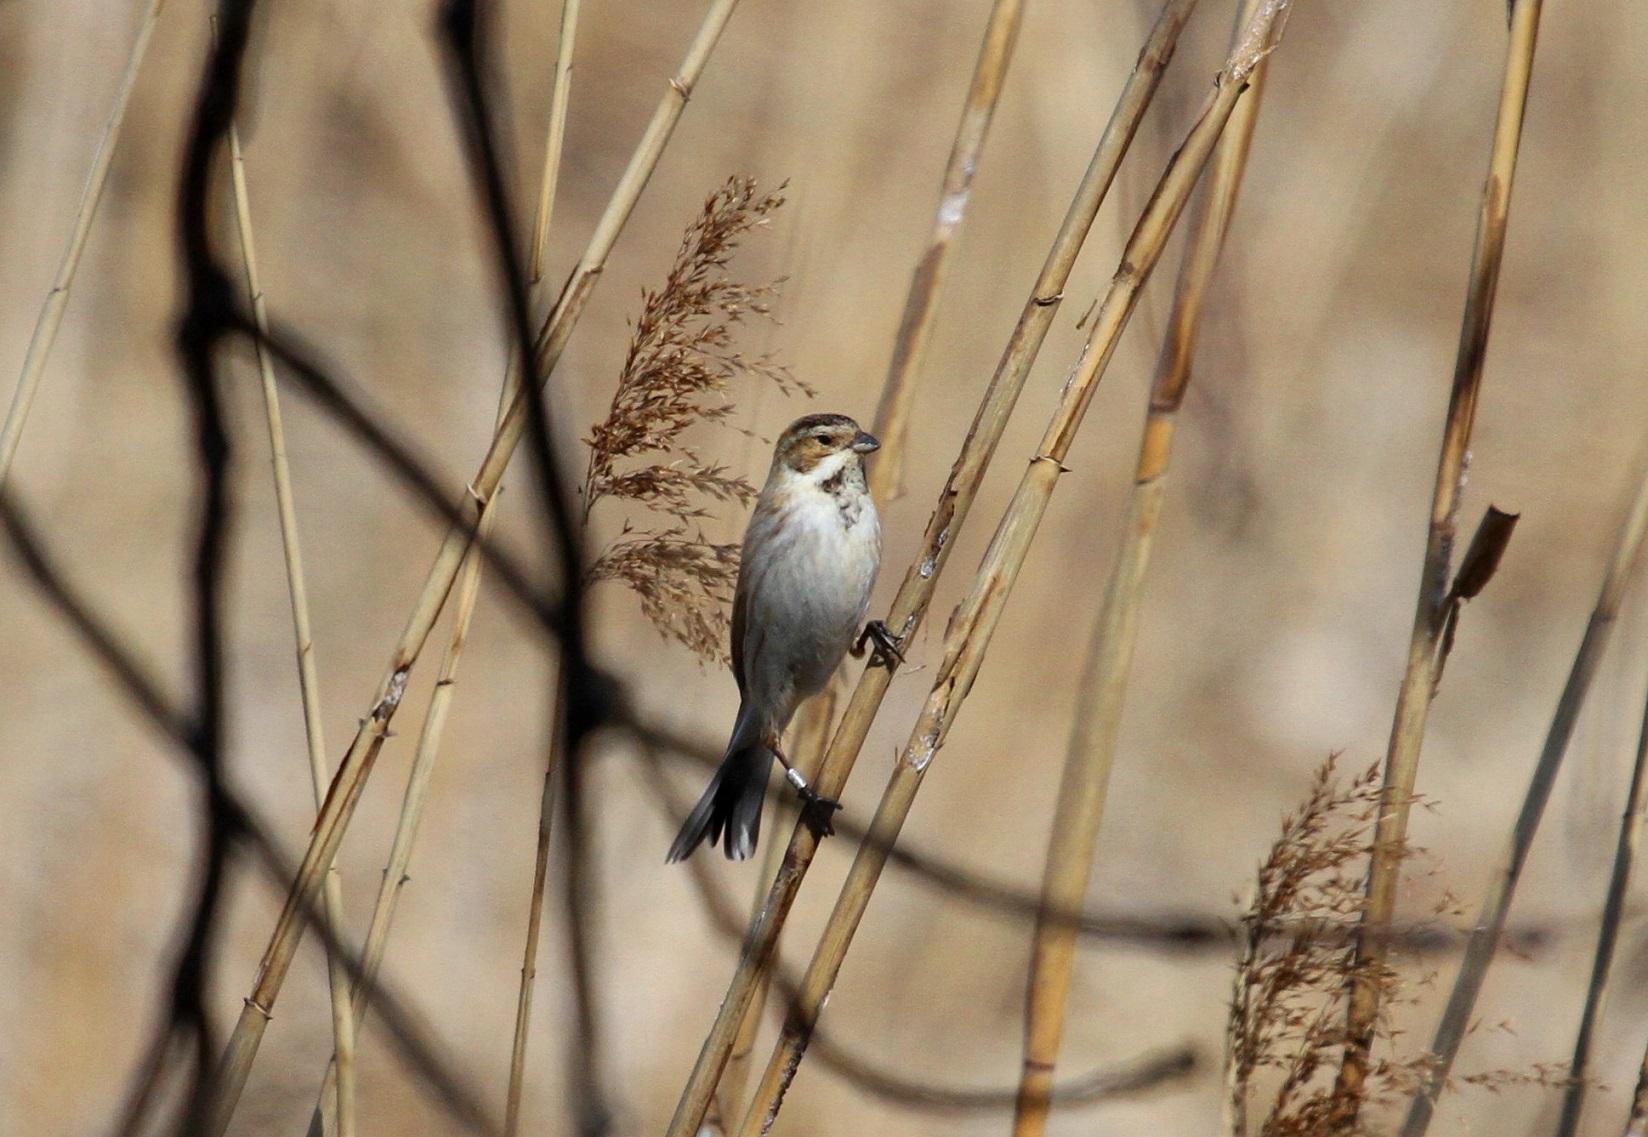 MFで出会えた、冬鳥オオジュリン冬羽から夏羽に変わりつつ_f0239515_21571335.jpg